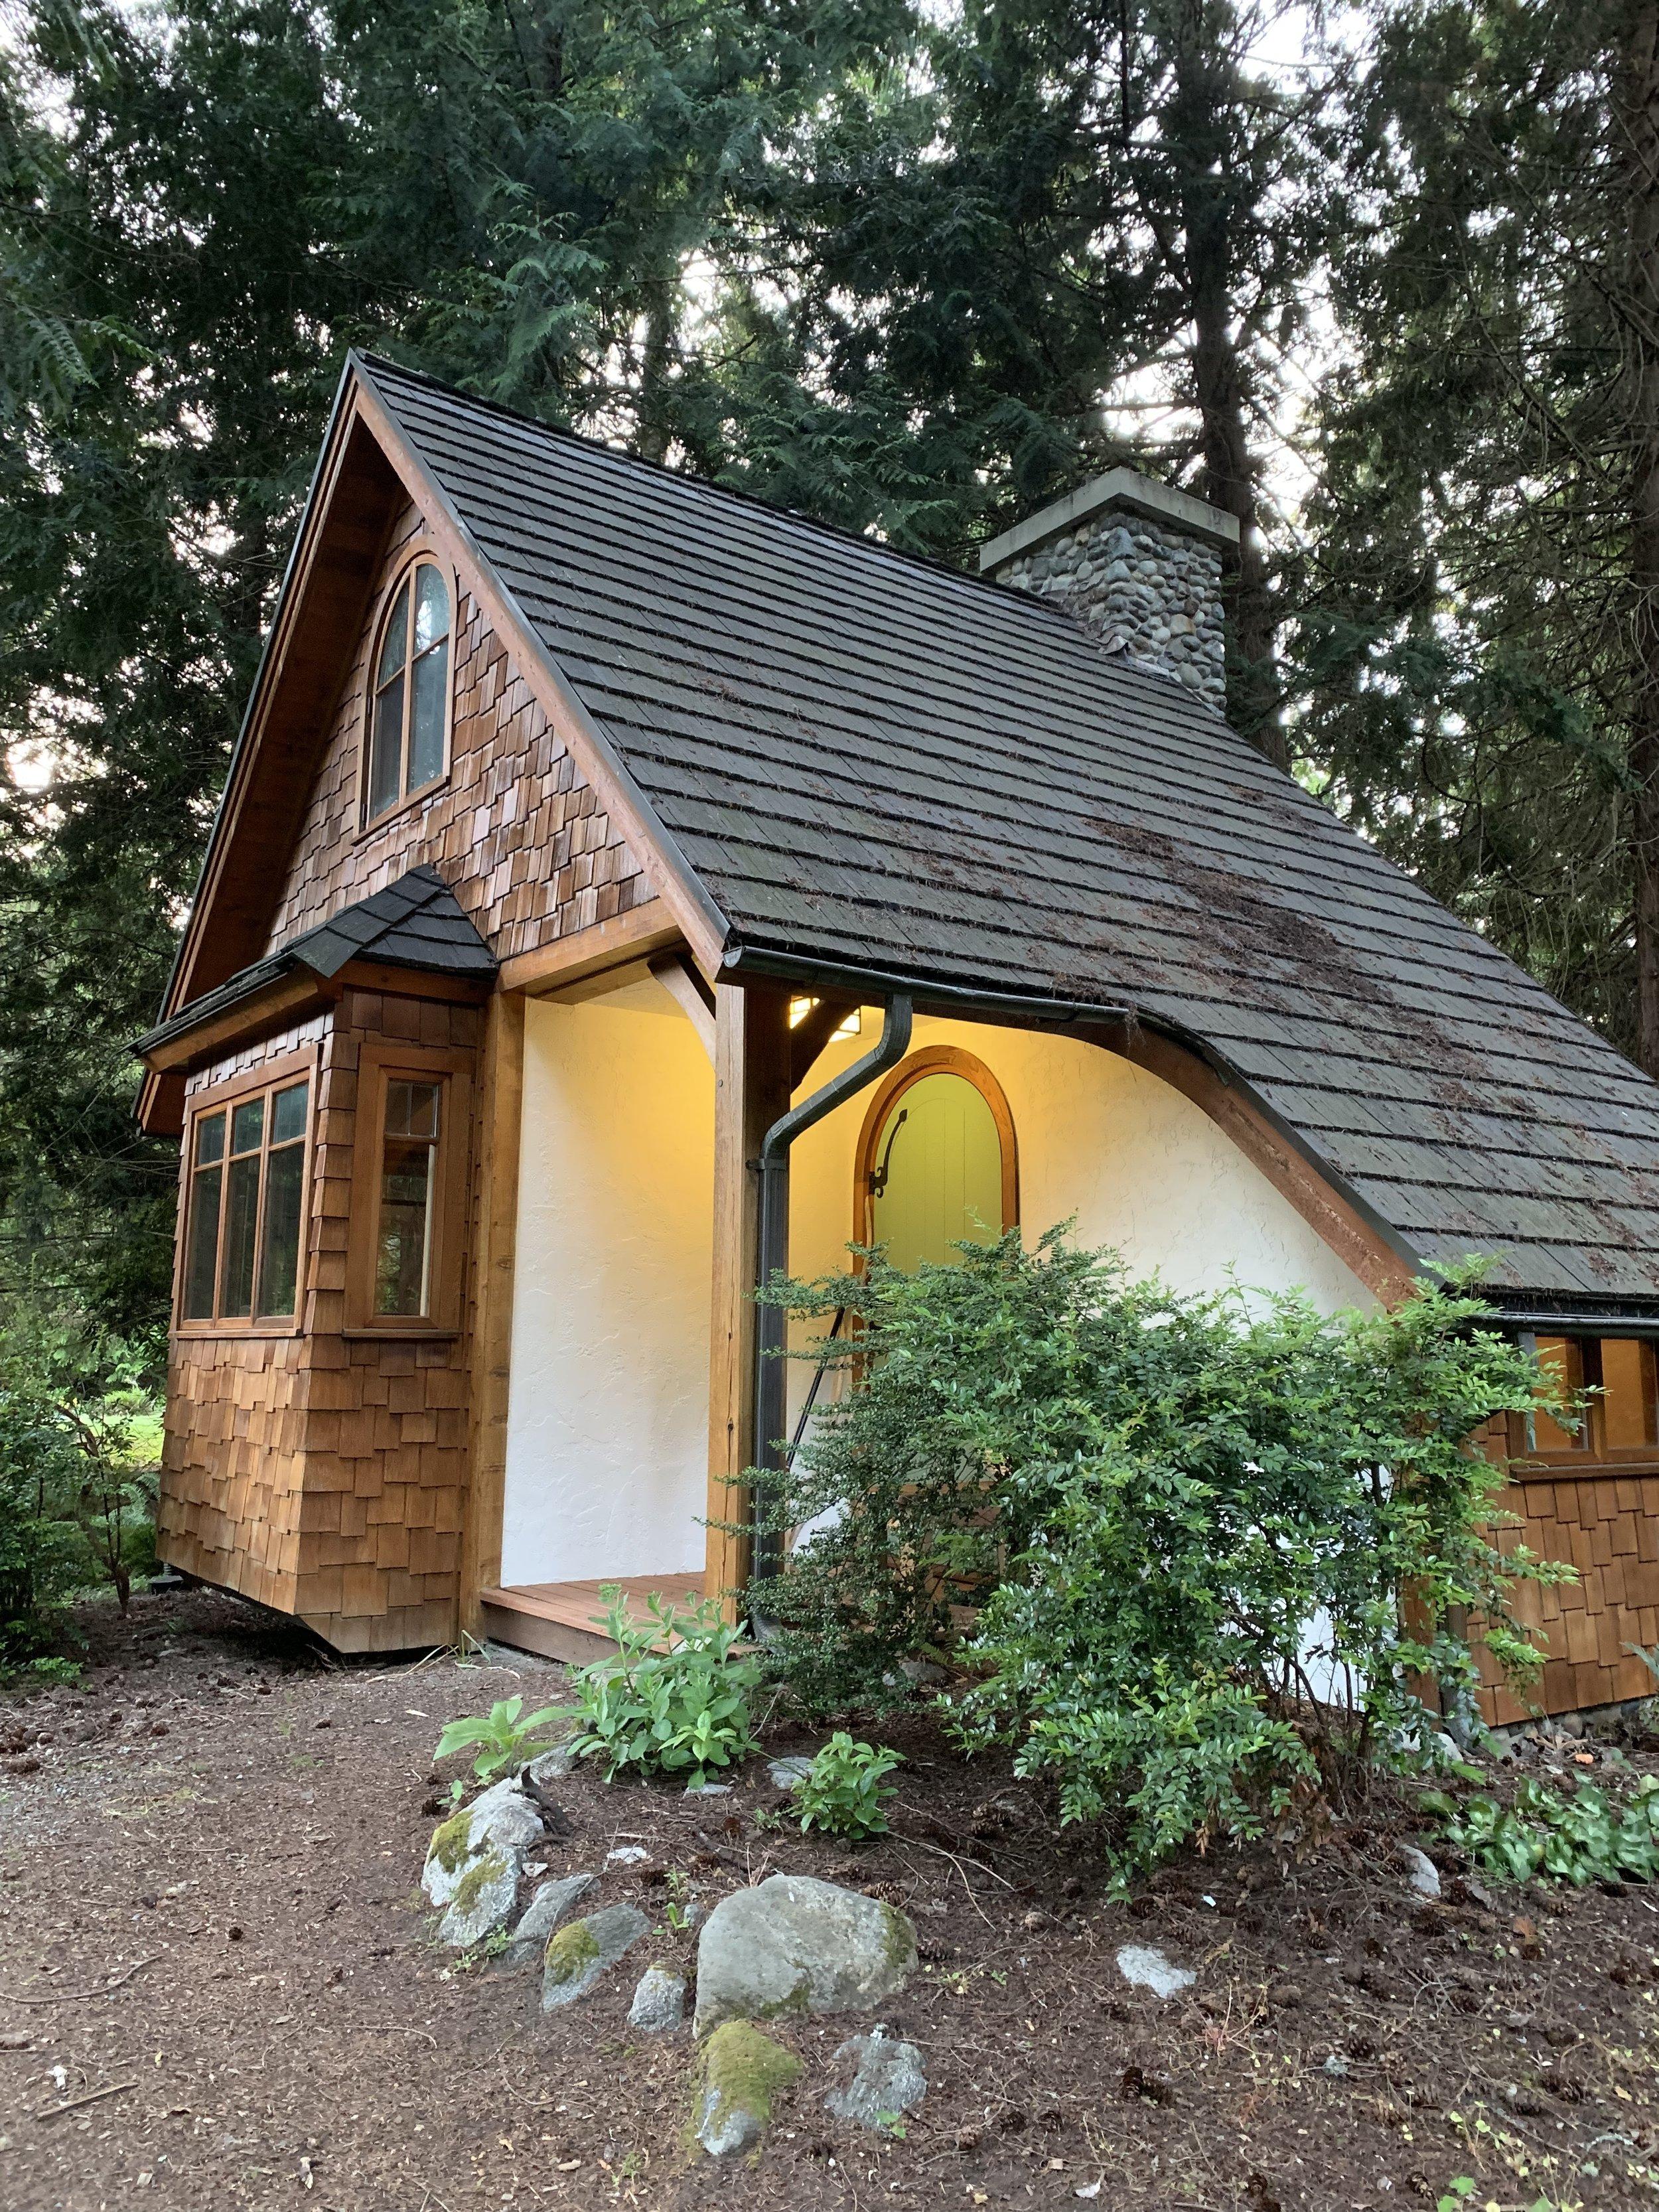 "My cottage, aptly named 'Oak"""